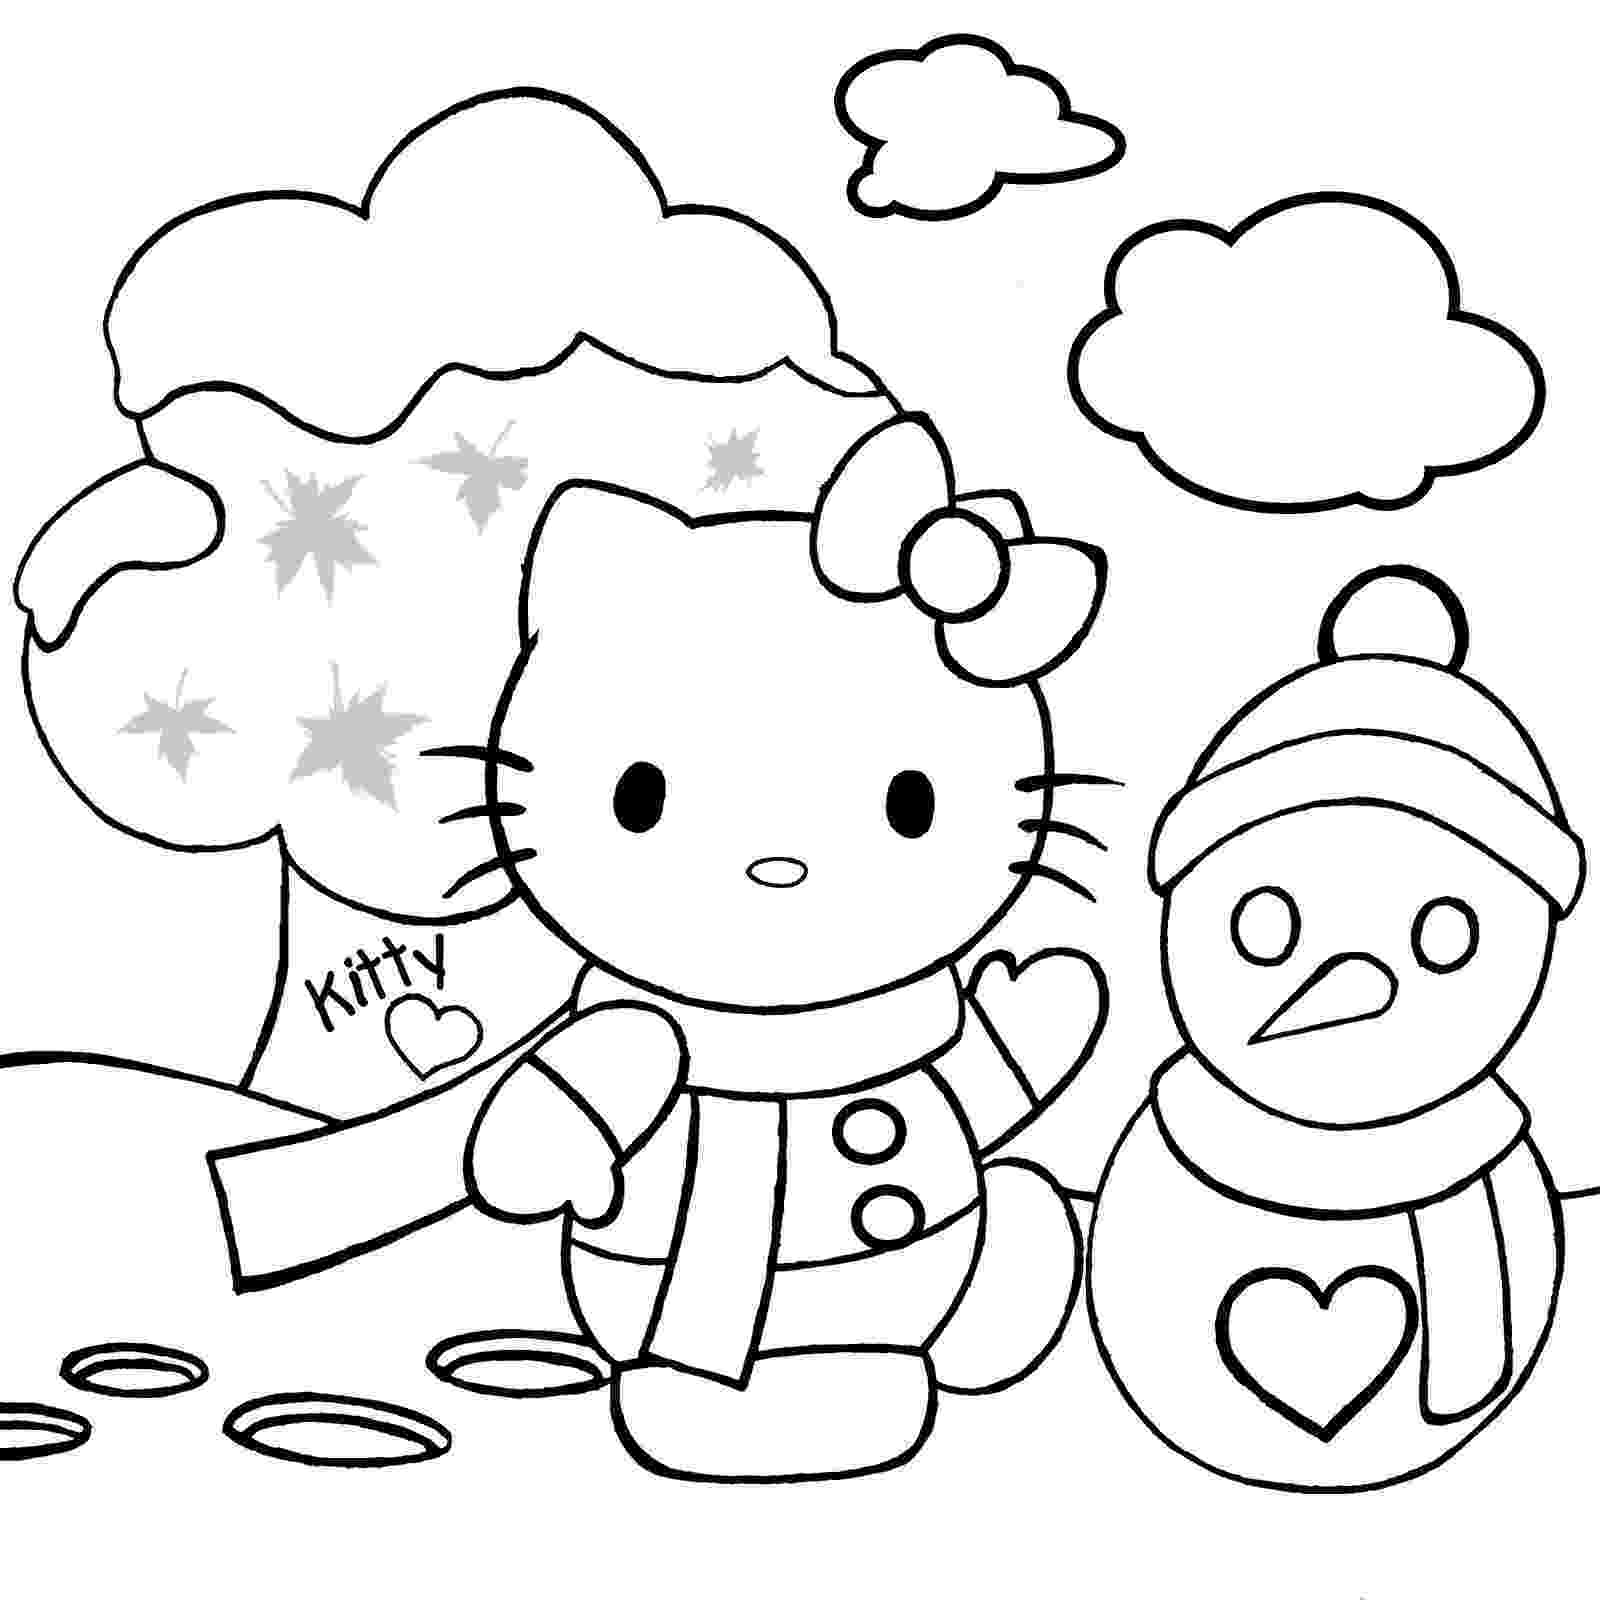 kitty pictures to print hello kitty christmas coloring pages 1 hello kitty forever pictures kitty print to